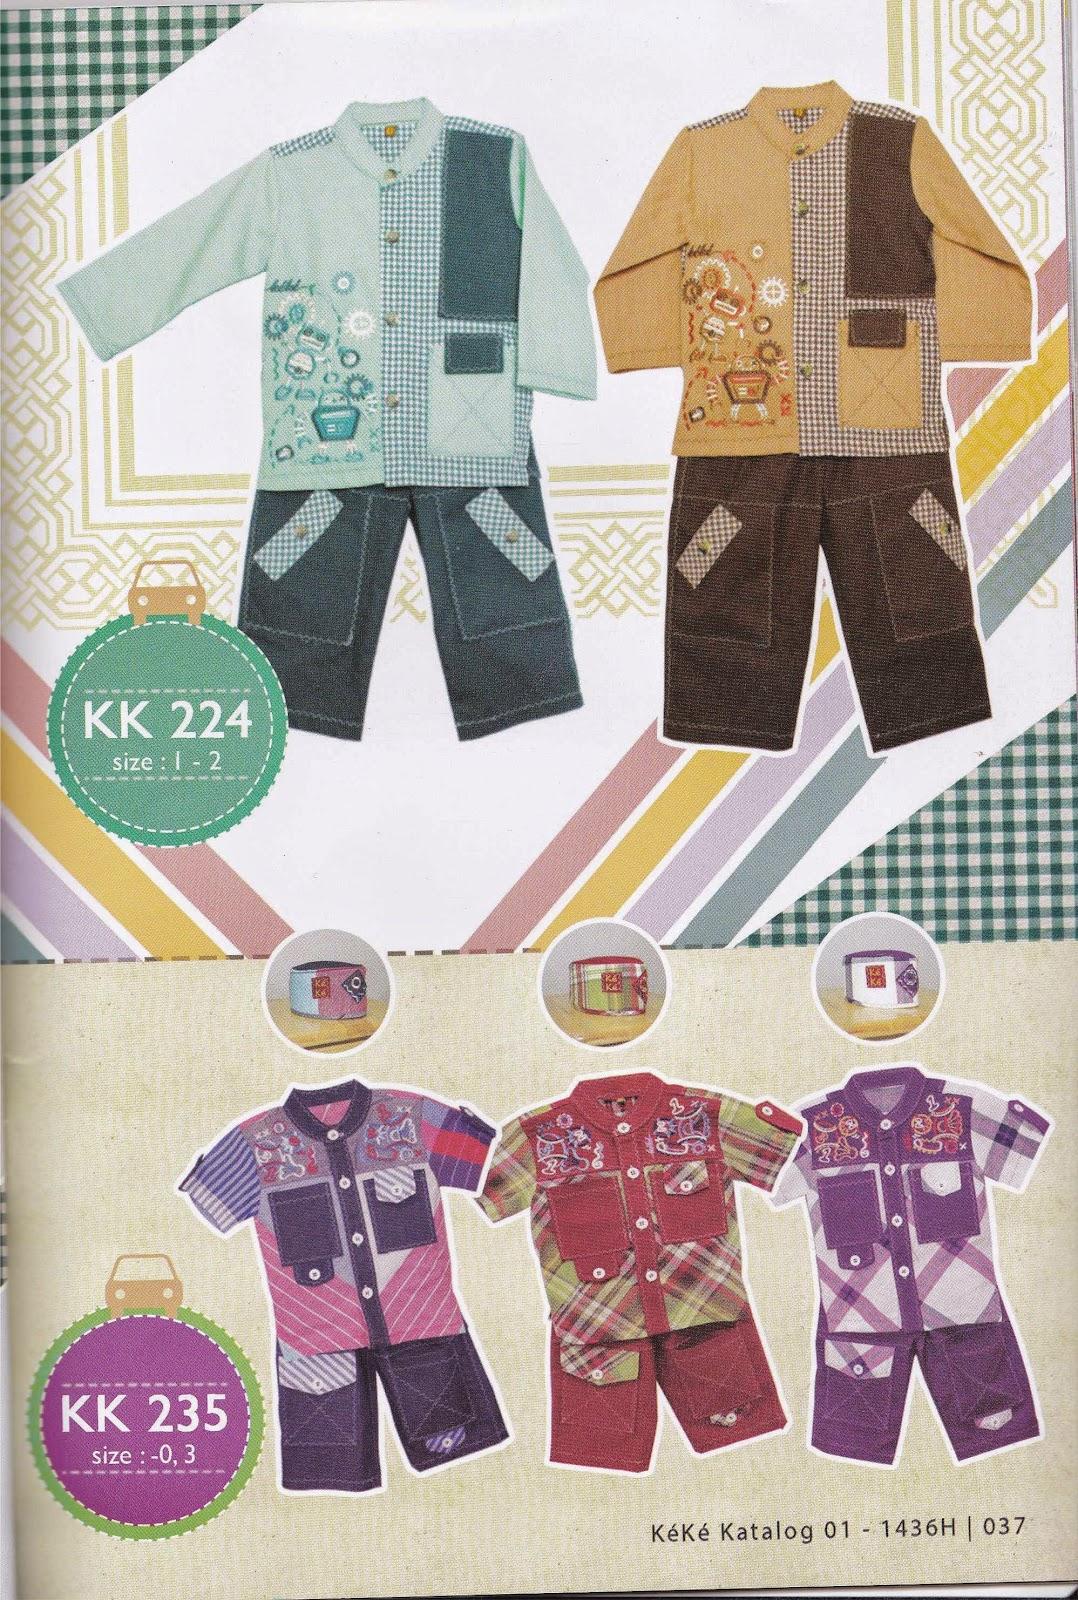 KK 224 Baju Muslim Anak